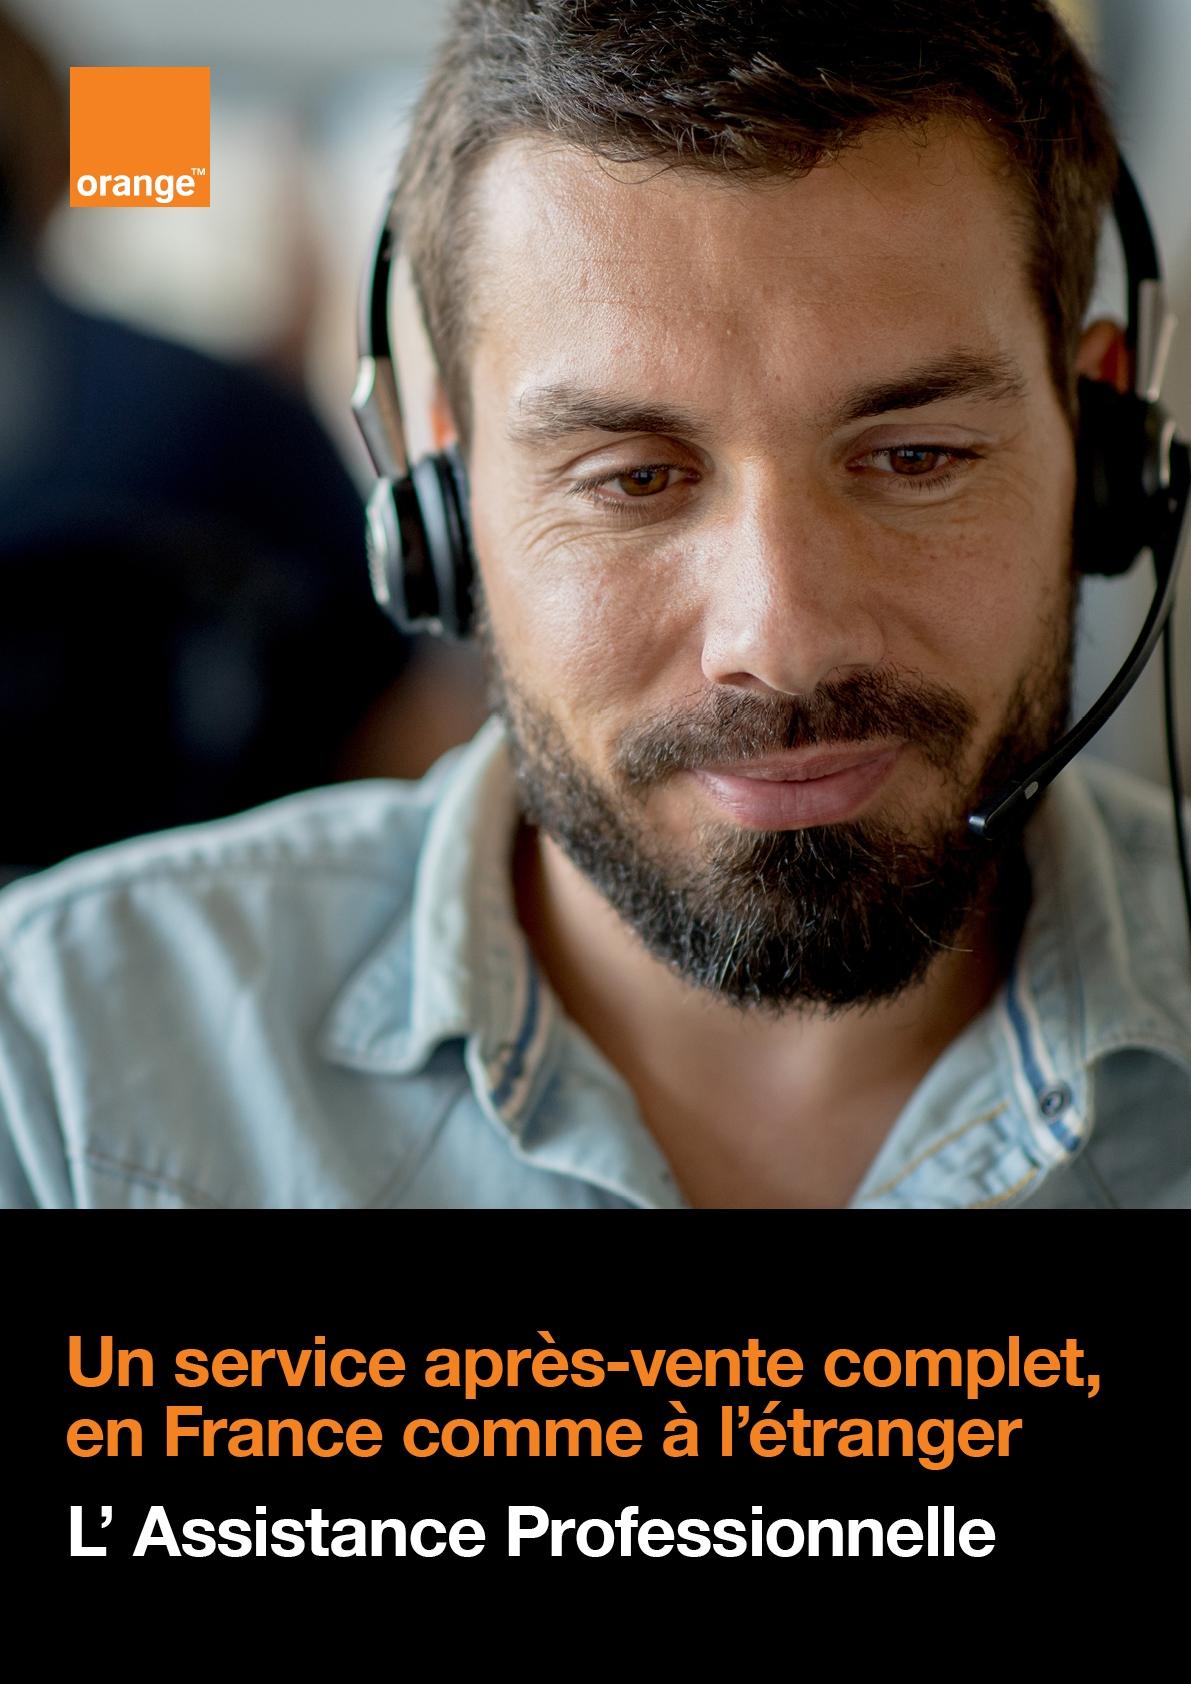 A4_Assistance_Professionnelle1.jpg